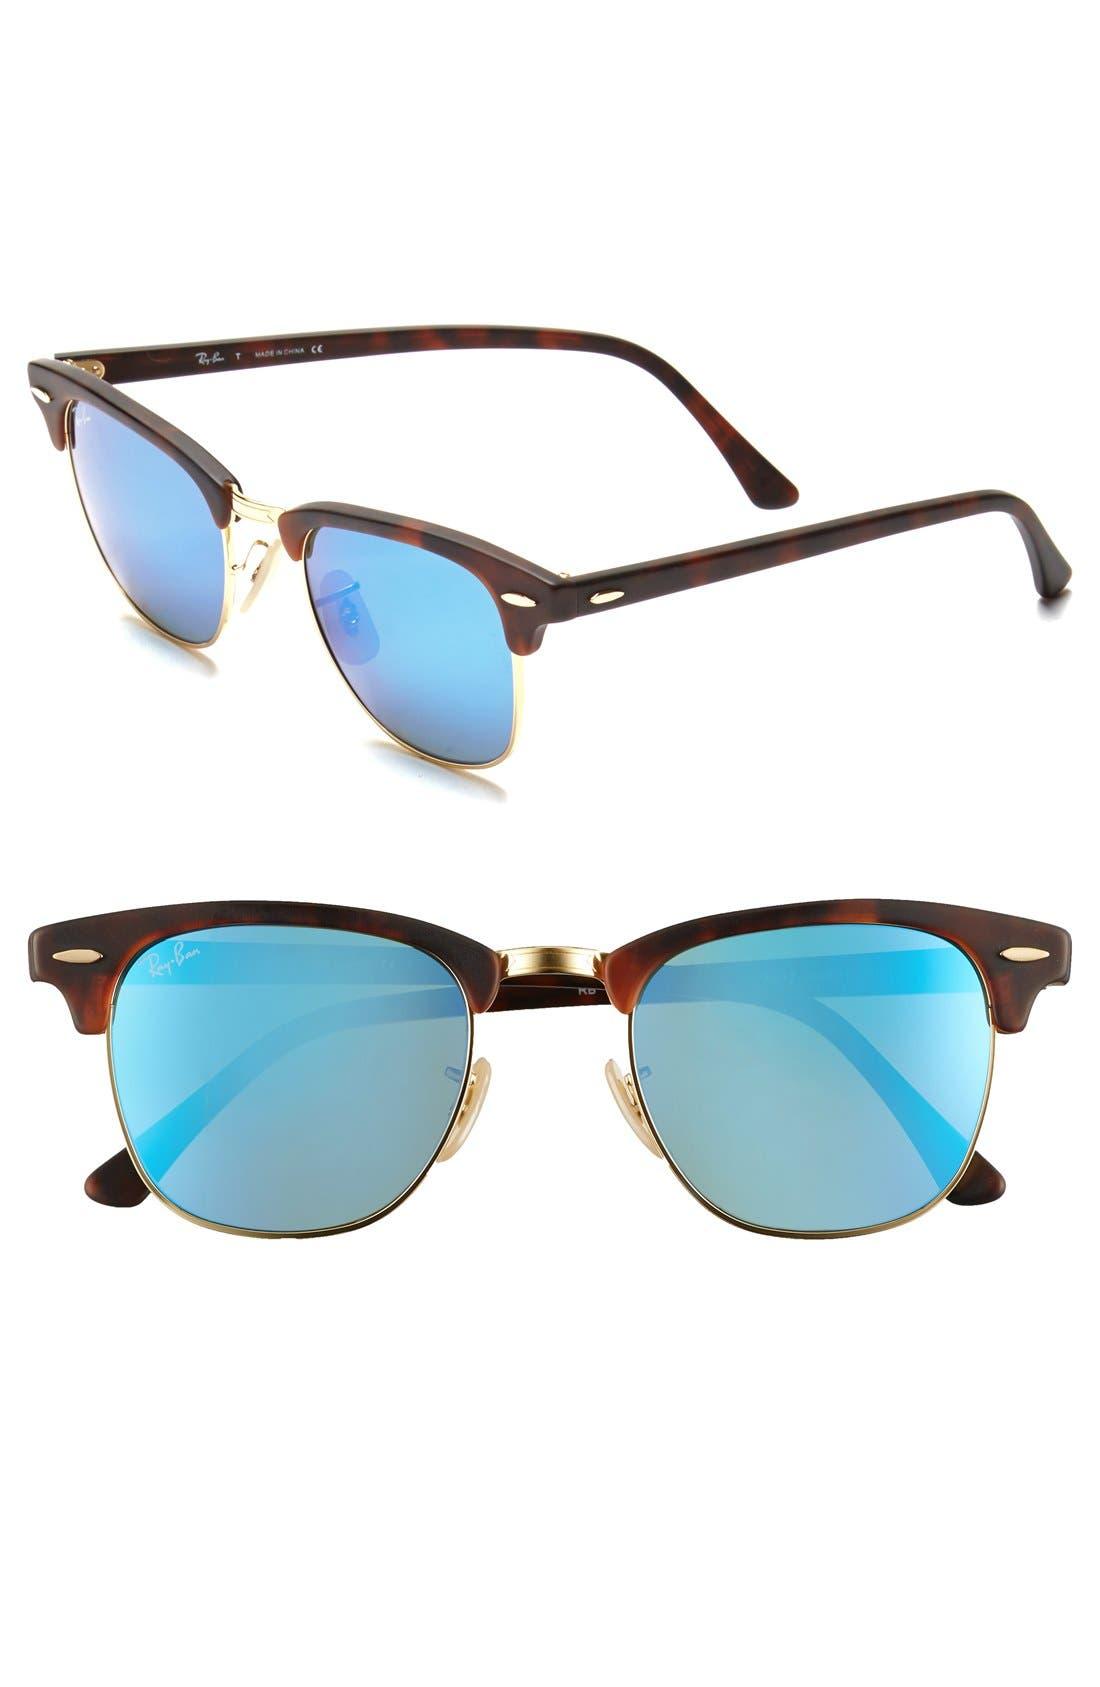 Flash Clubmaster 51mm Sunglasses,                             Main thumbnail 1, color,                             TORTOISE/ BLUE MIRROR